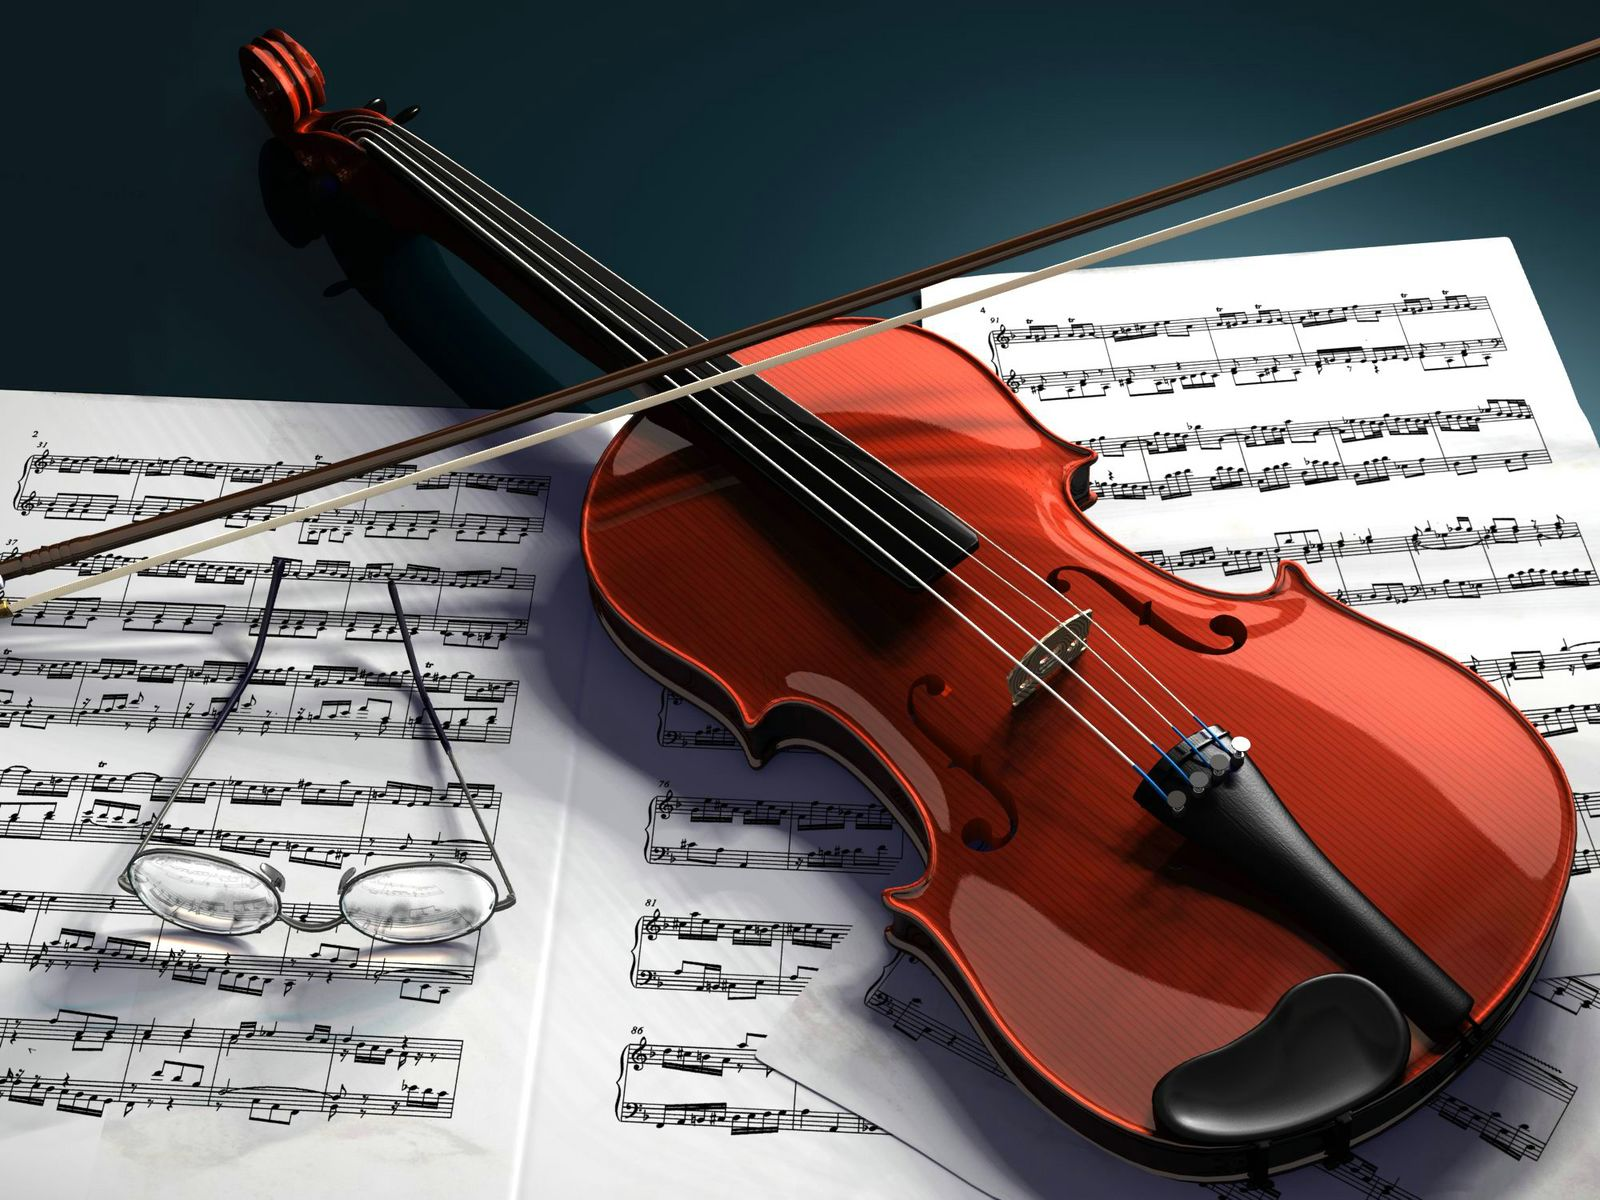 Violin Latest HD Wallpapers | Best HD Desktop Wallpapers